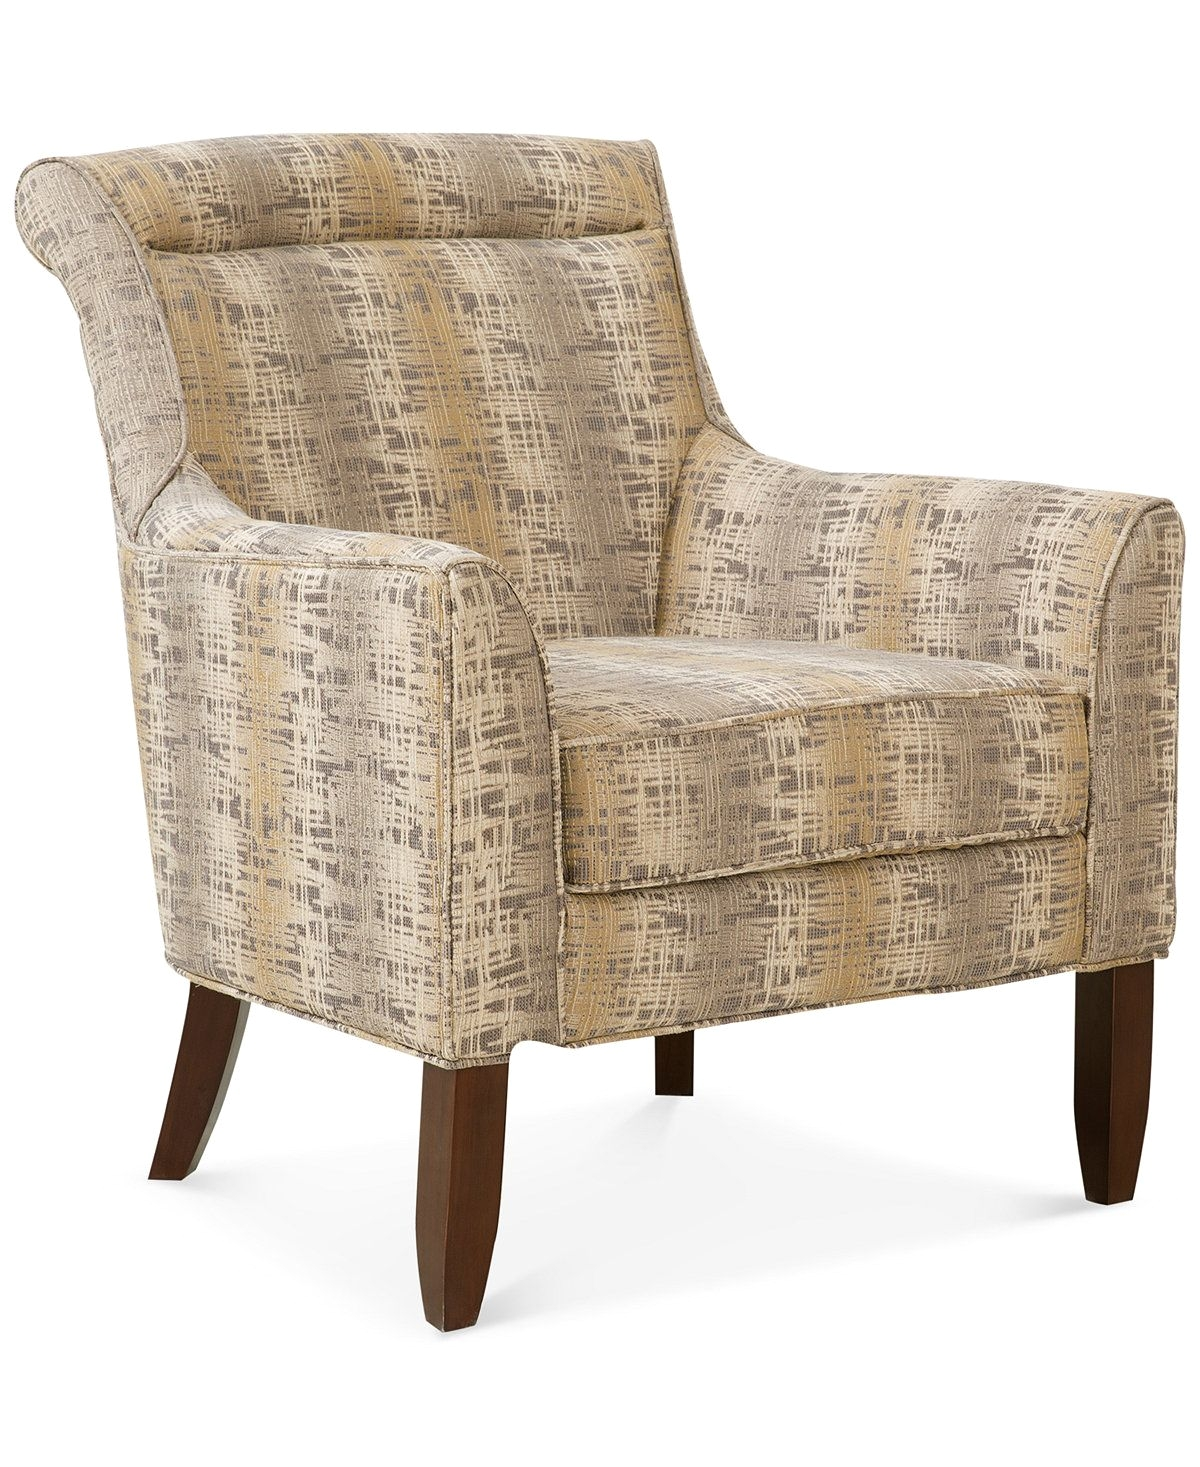 Admirable Macys Leather Club Chair Kannen Accent Chair Quick Ship Inzonedesignstudio Interior Chair Design Inzonedesignstudiocom